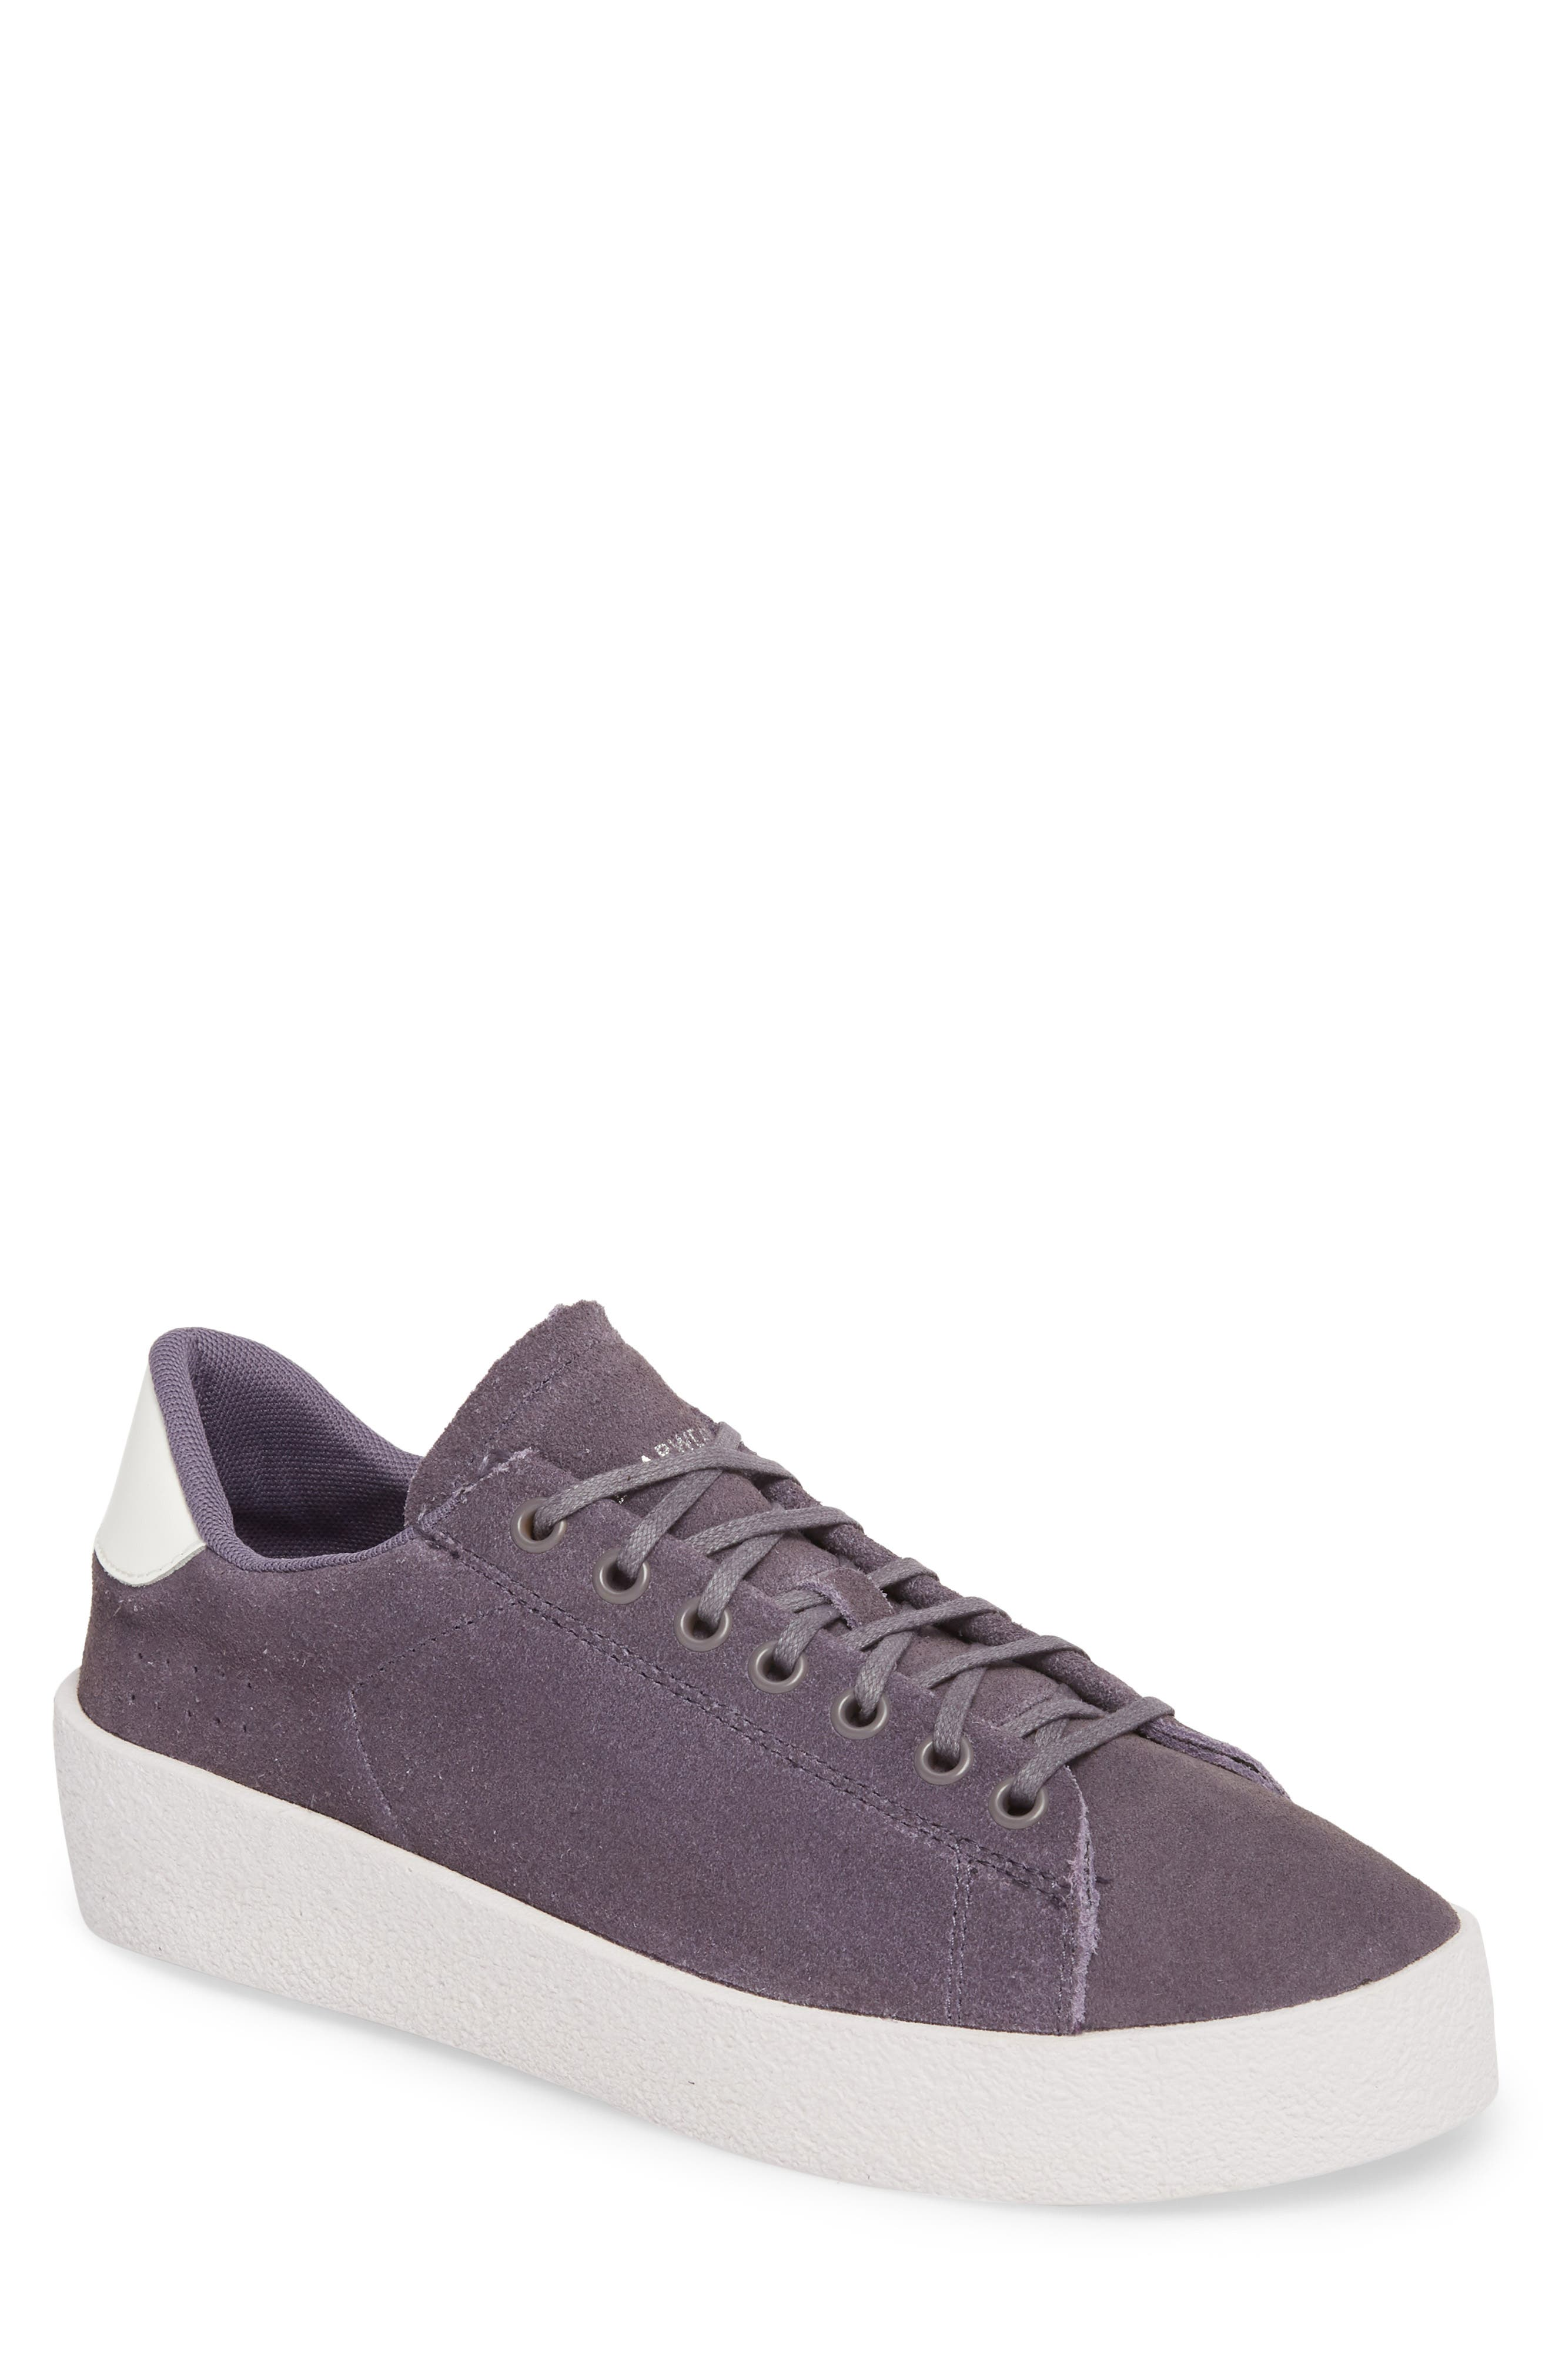 Jones Platform Sneaker,                             Main thumbnail 1, color,                             Purple Leather